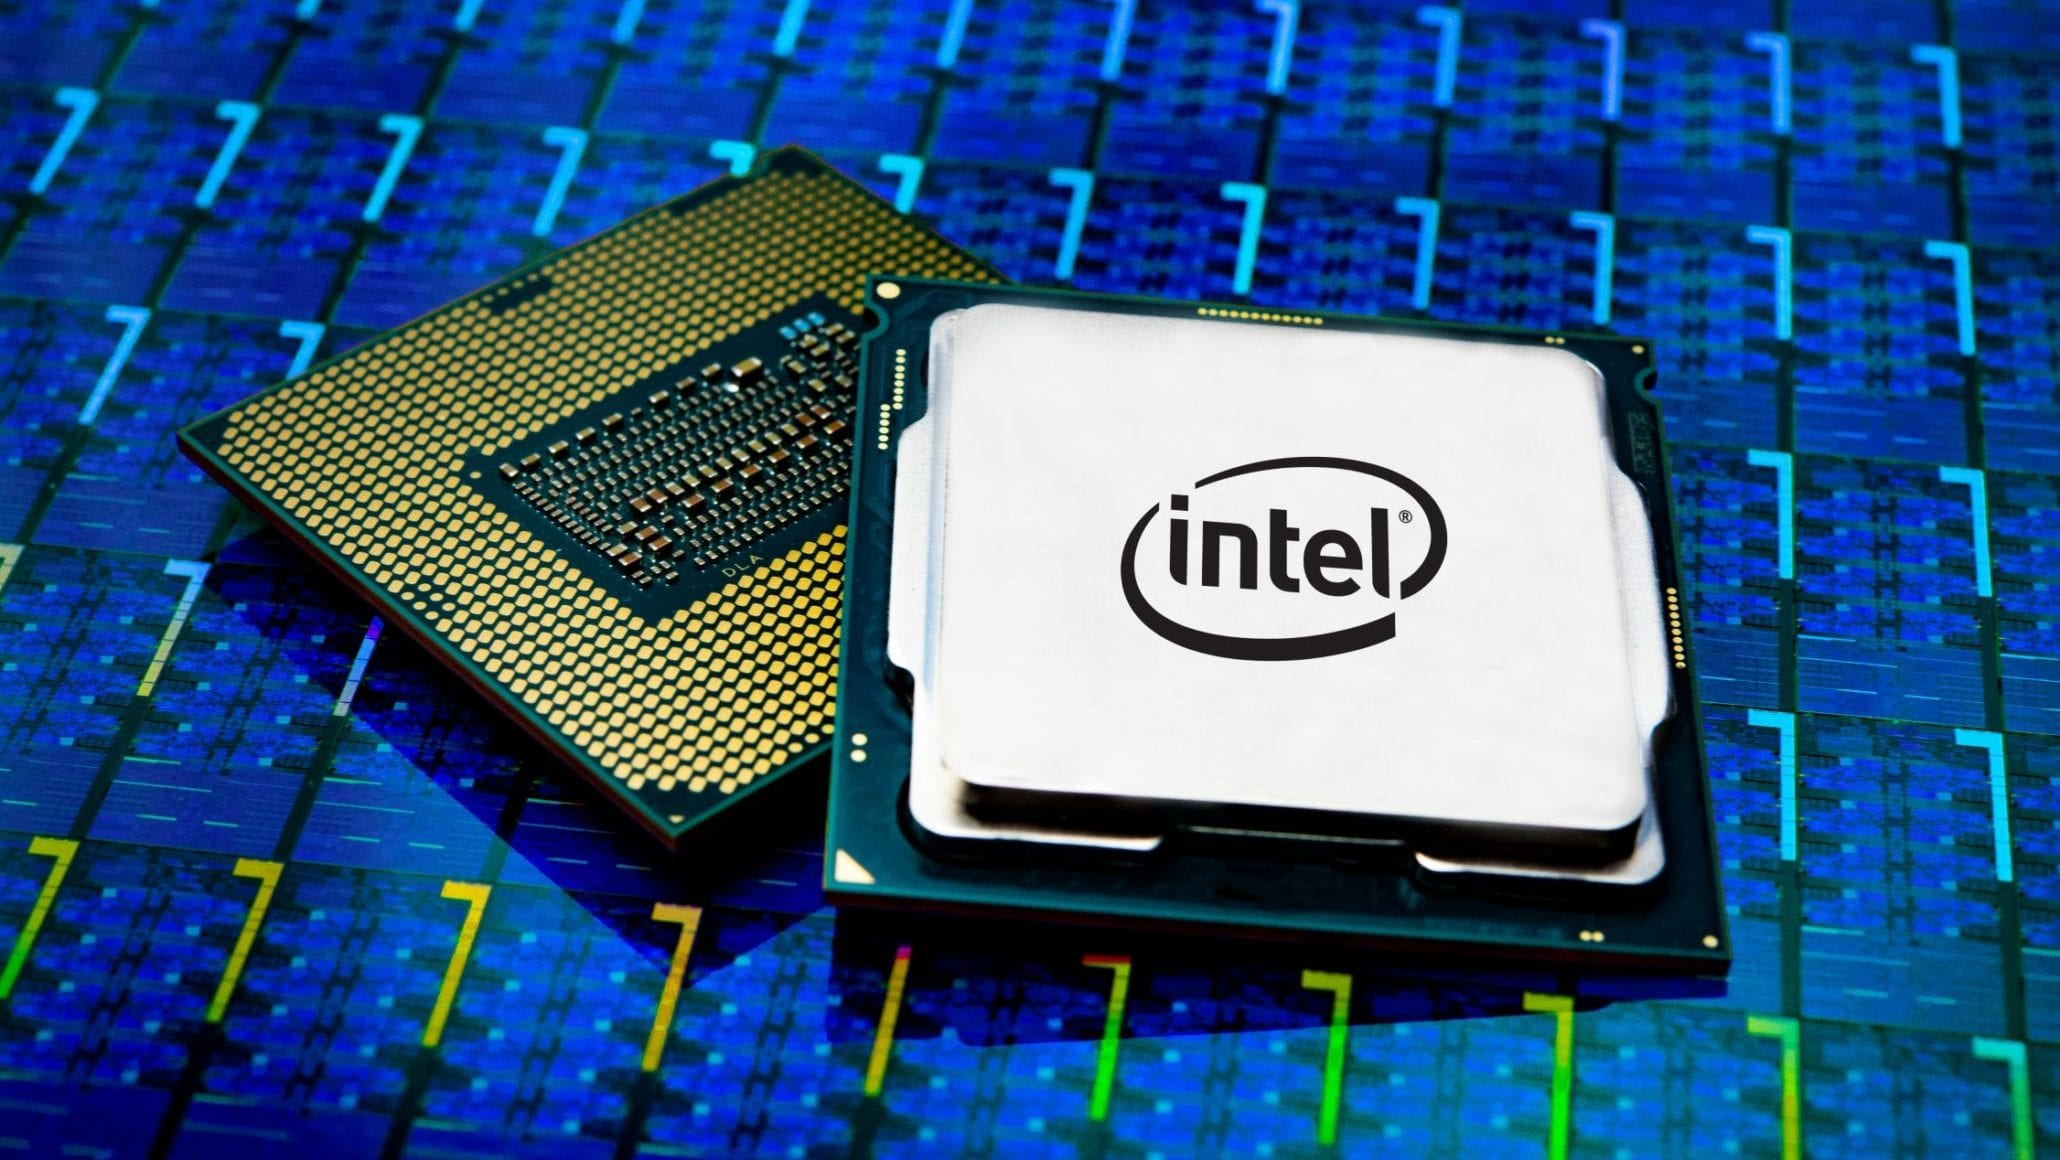 Intel Core i9-10900KF 10-core processor has similar performance to AMD 12-core Ryzen 9 3900X